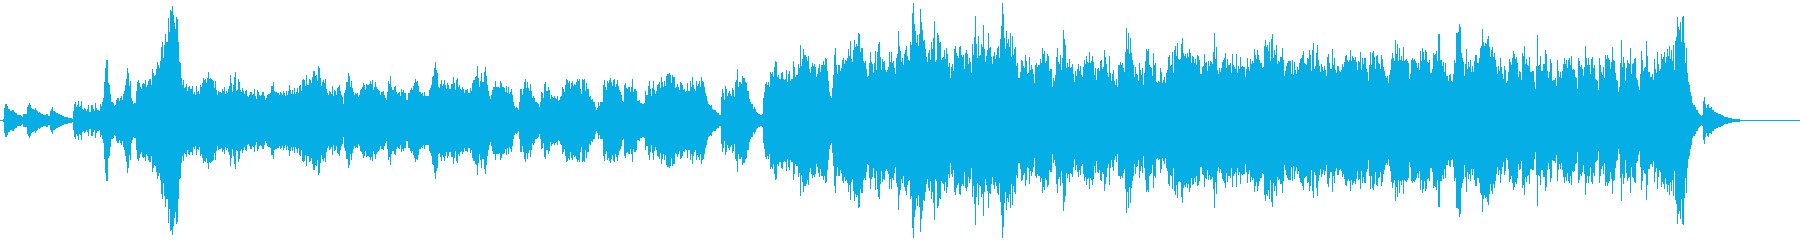 WIZARD'S APPRENTICEの再生済みの波形